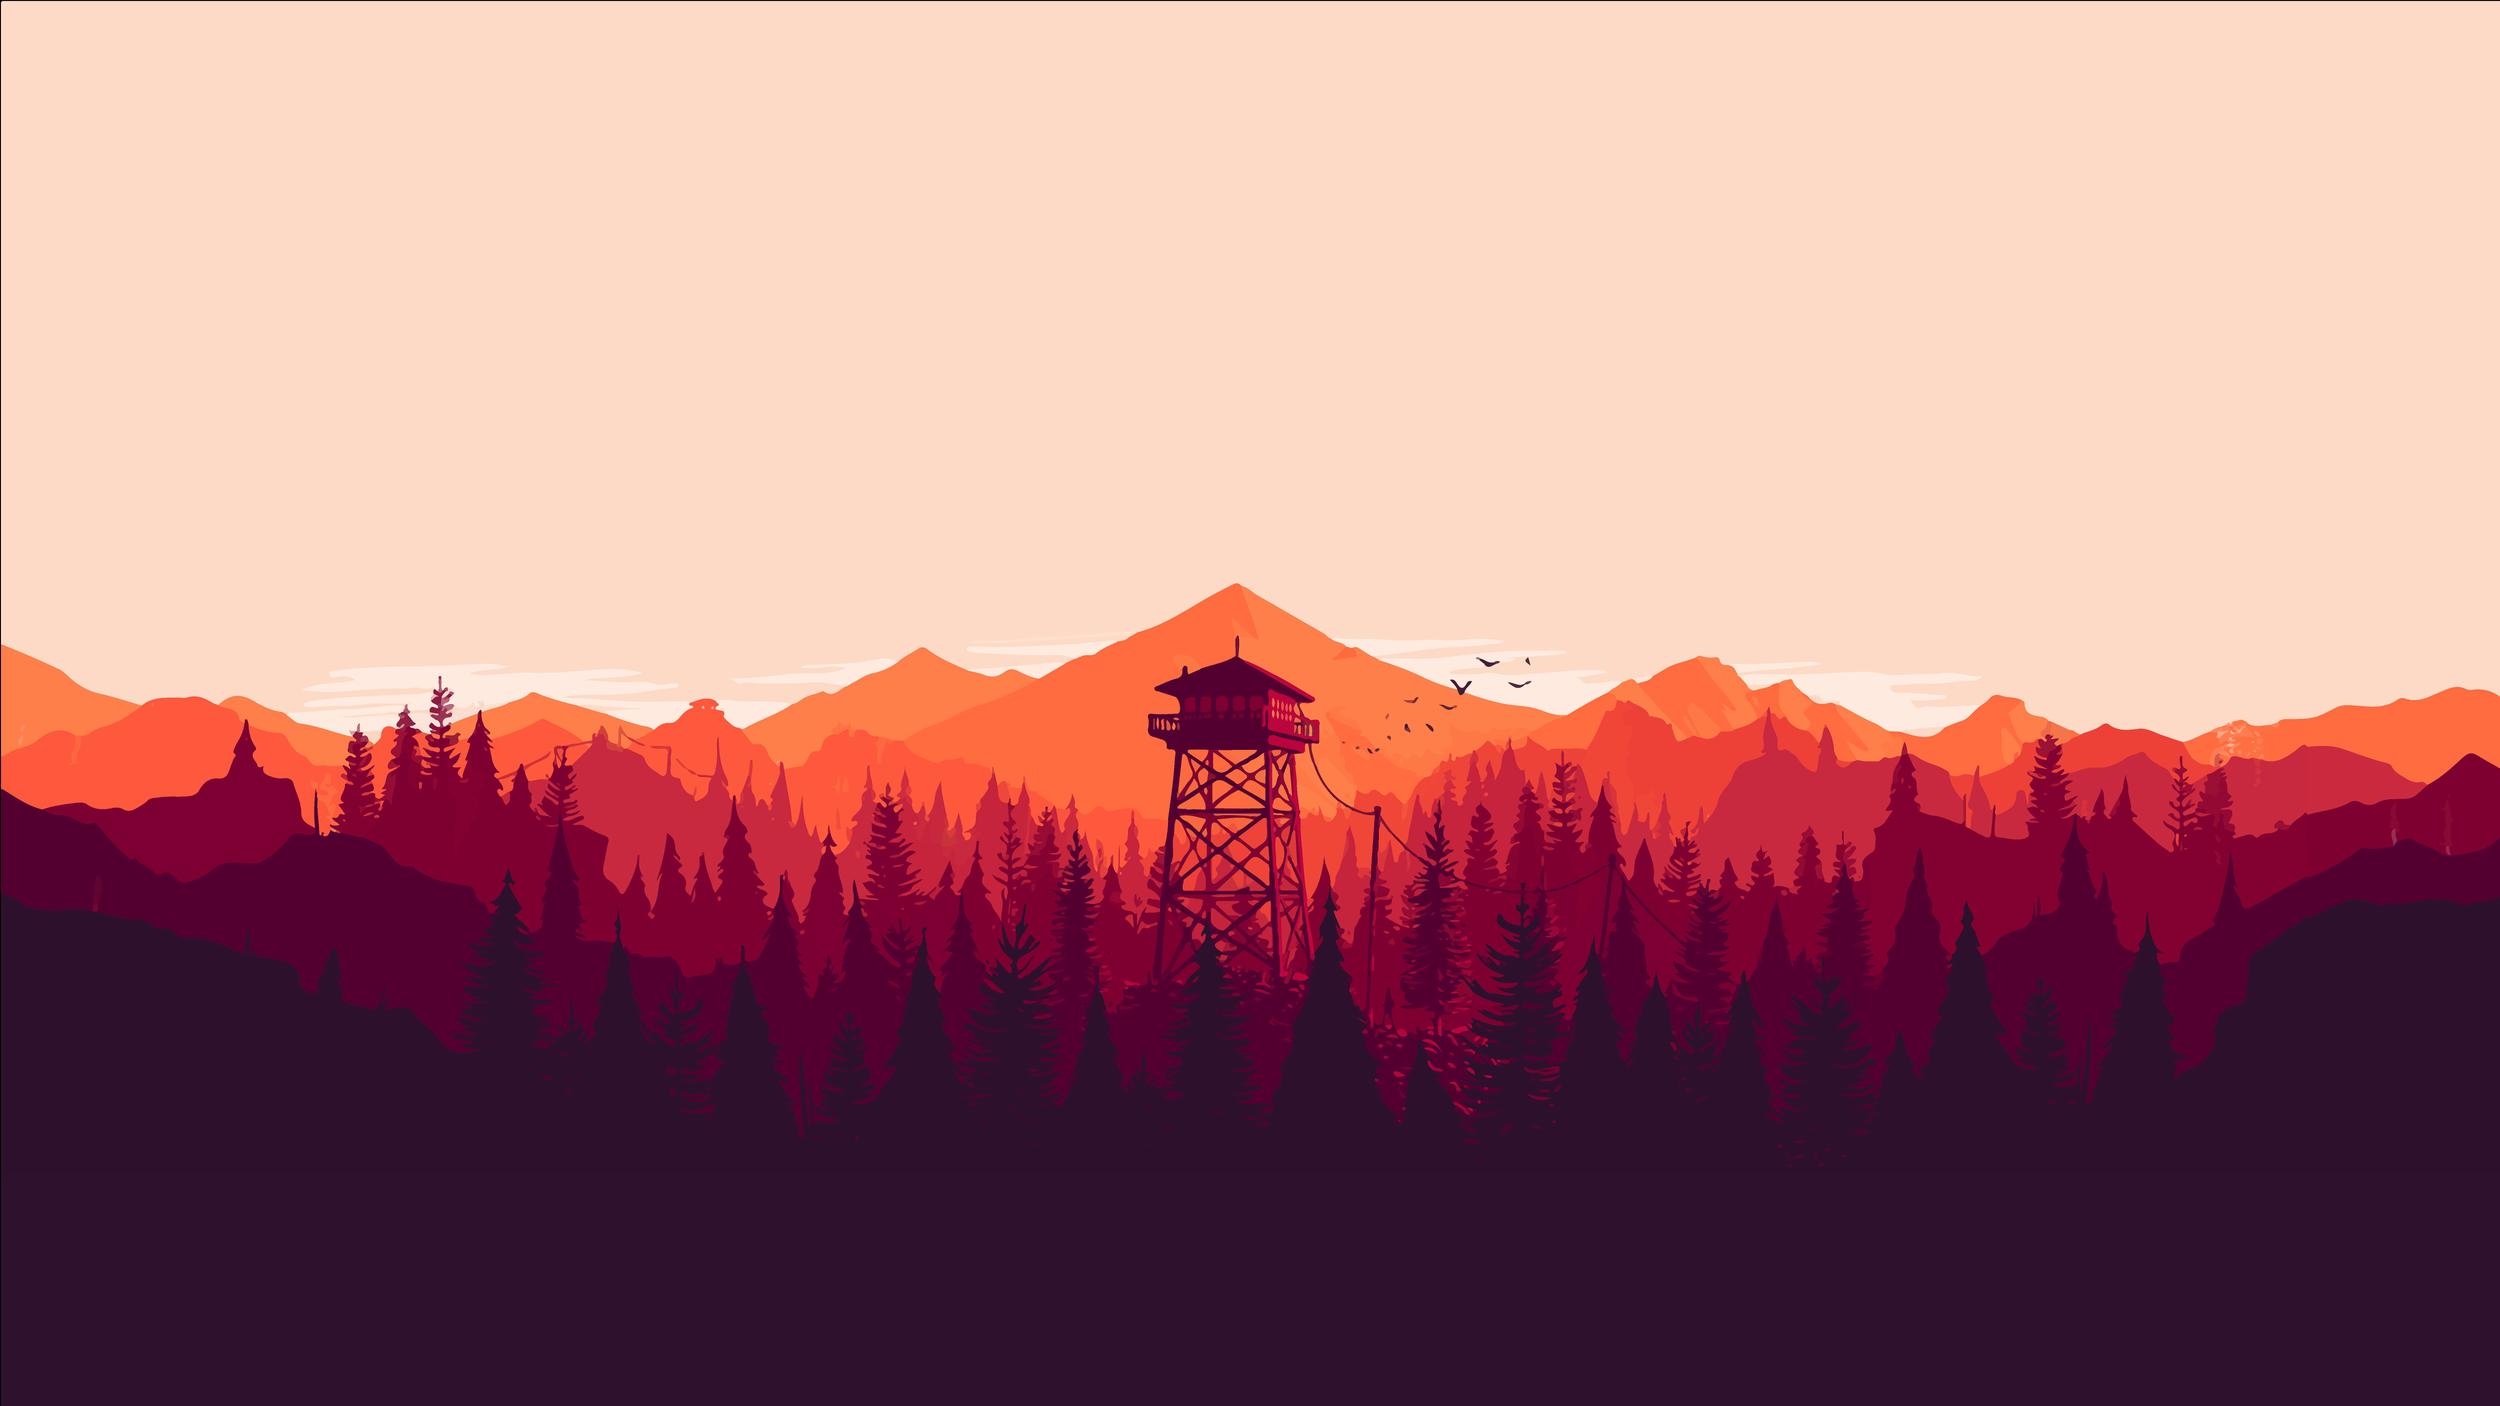 Minimal-Mountain-Wallpaper-Fireward-Red-Hues-DarGadgetZ-1.png